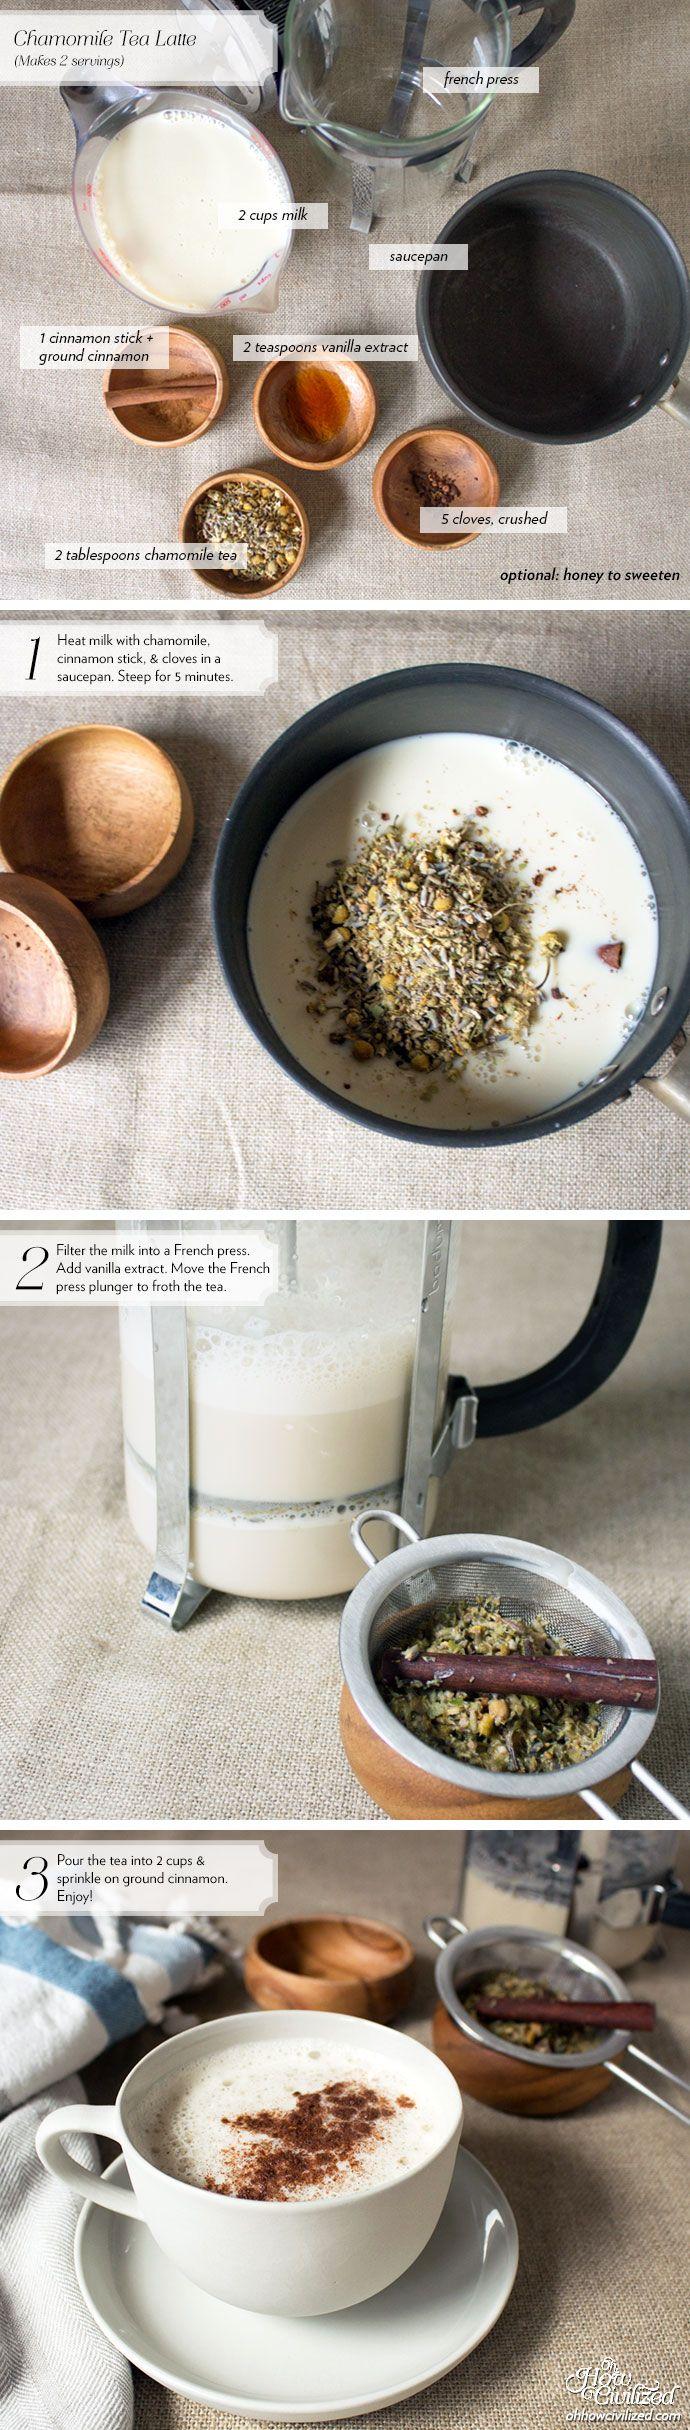 Chamomile Tea Latte - Oh, How Civilized